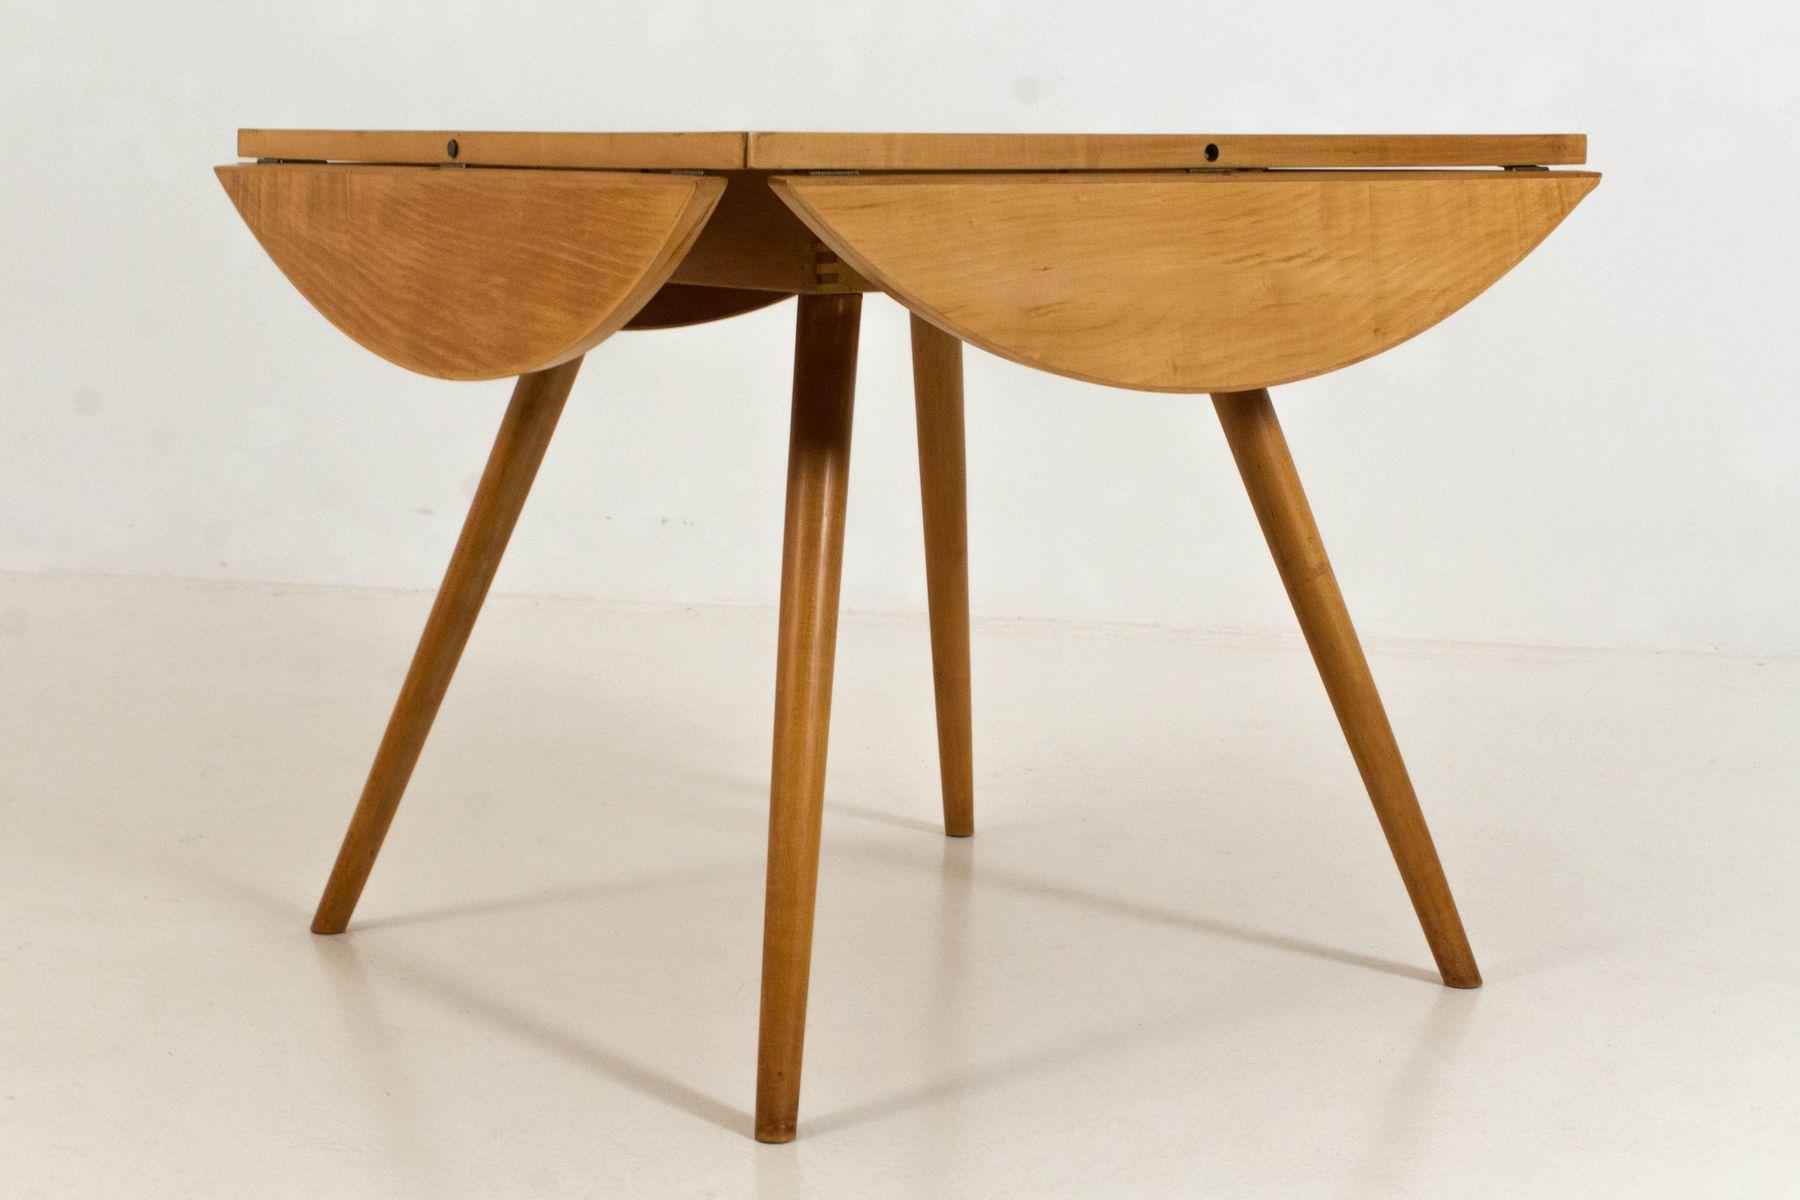 Tavolo con anta ribaltabile e 3 sedie di Cees Braakman per Pastoe ...